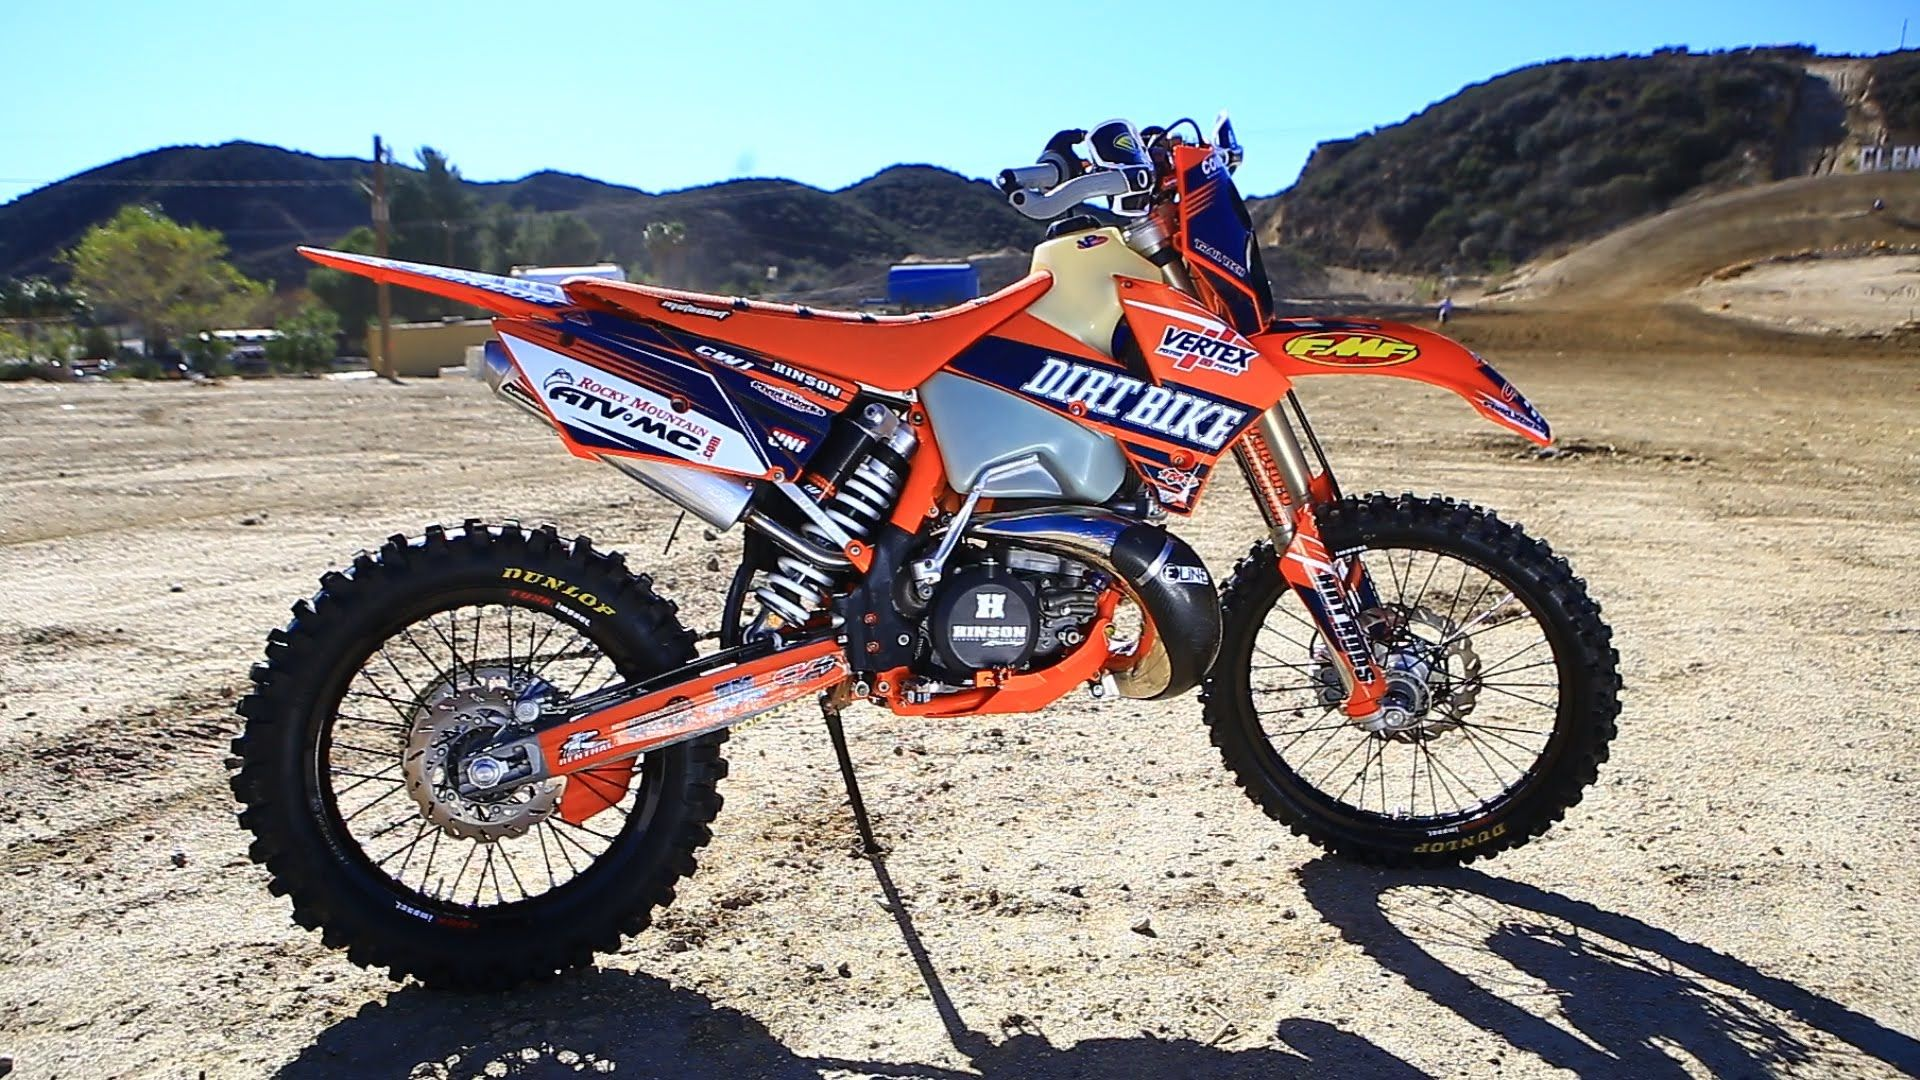 2 Stroke Dirt Bike Wallpapers - Top Free 2 Stroke Dirt ...